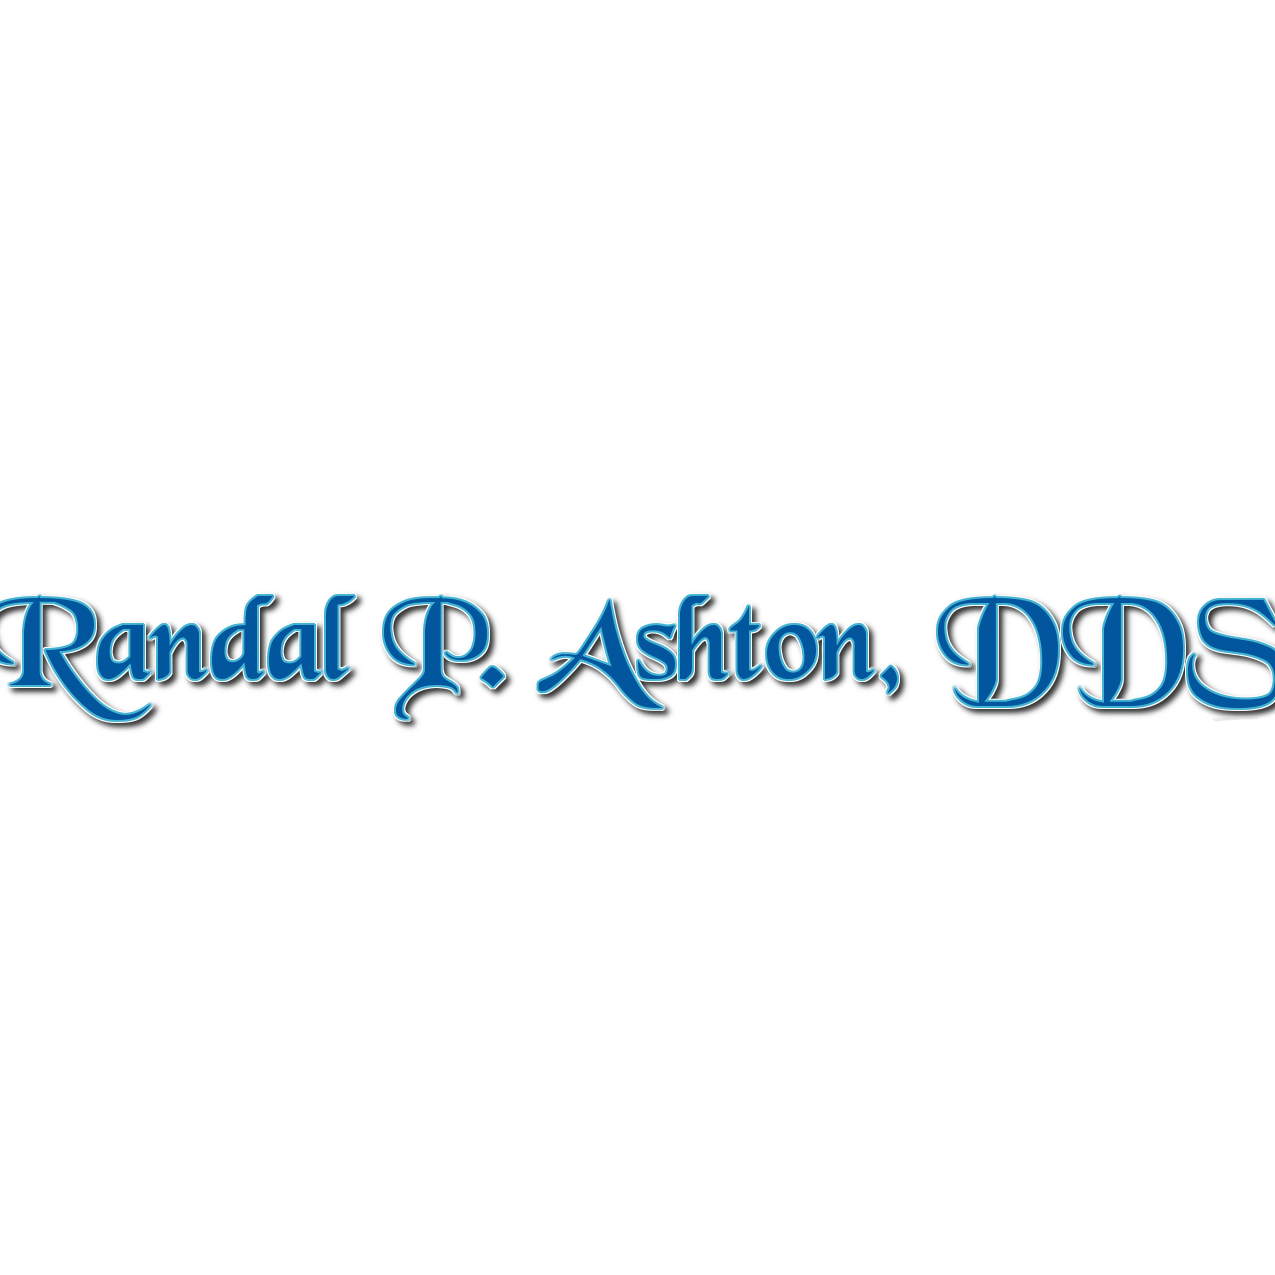 Randal P. Ashton, DDS